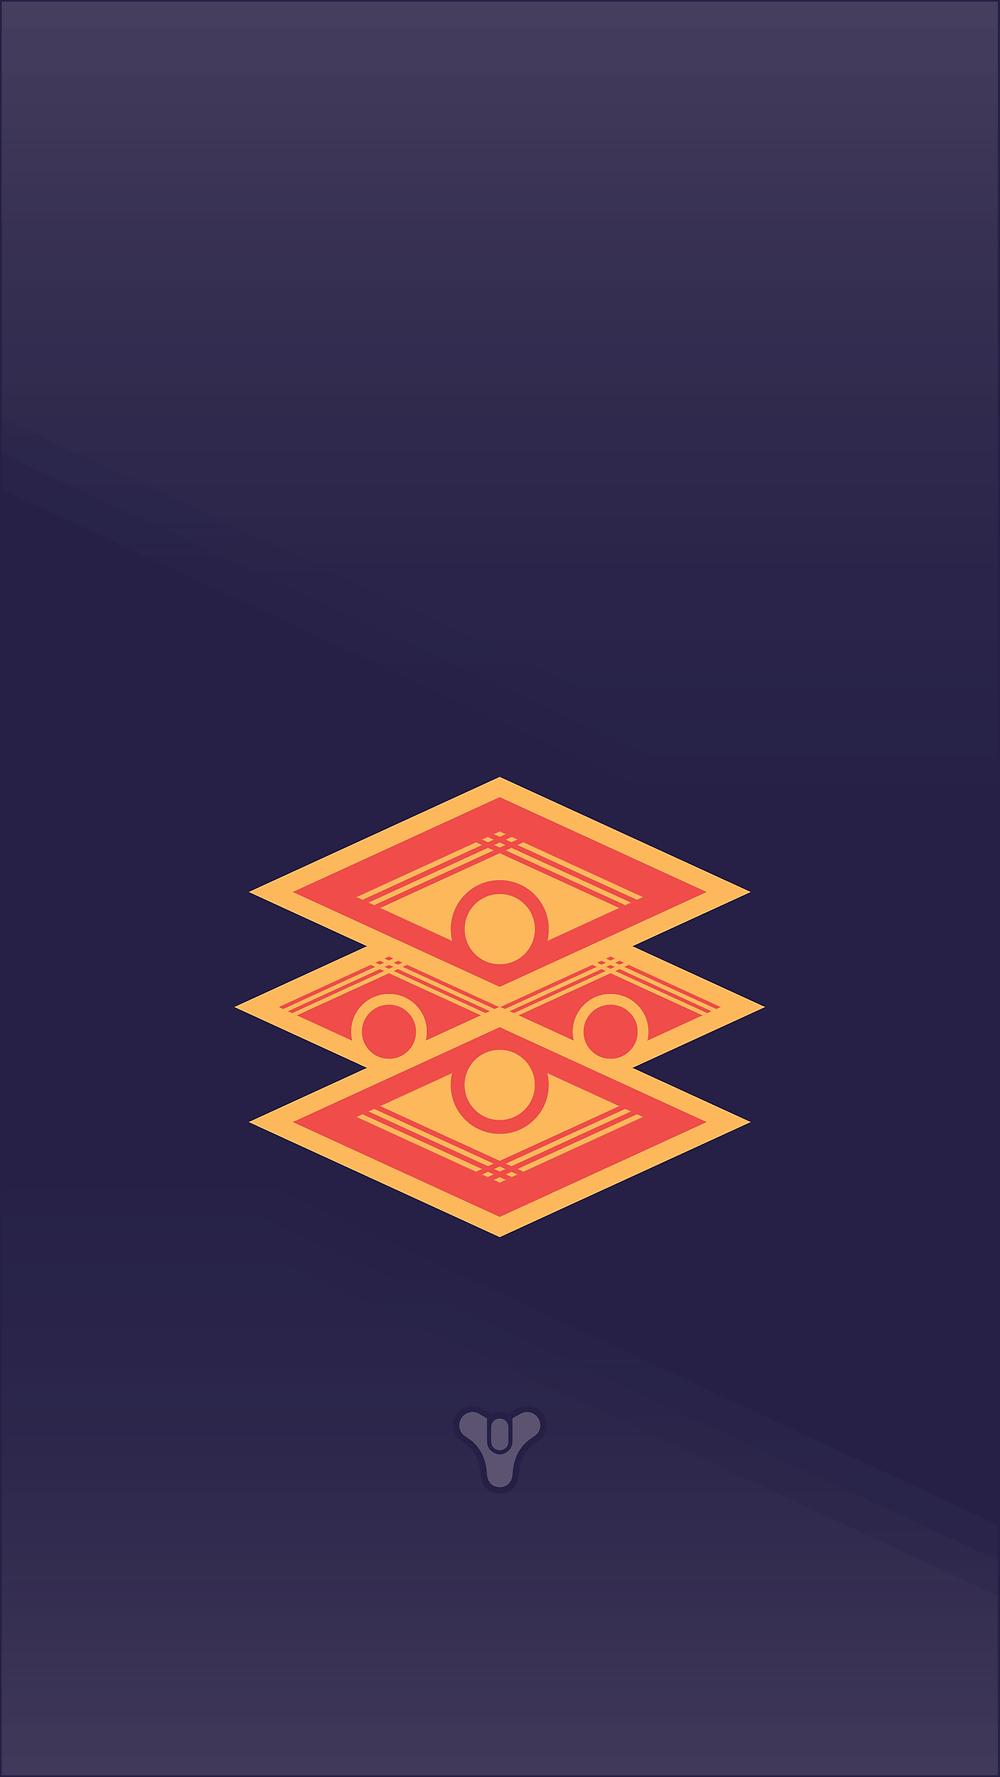 Sigil of the Burning Dawn - 1440x2560.png